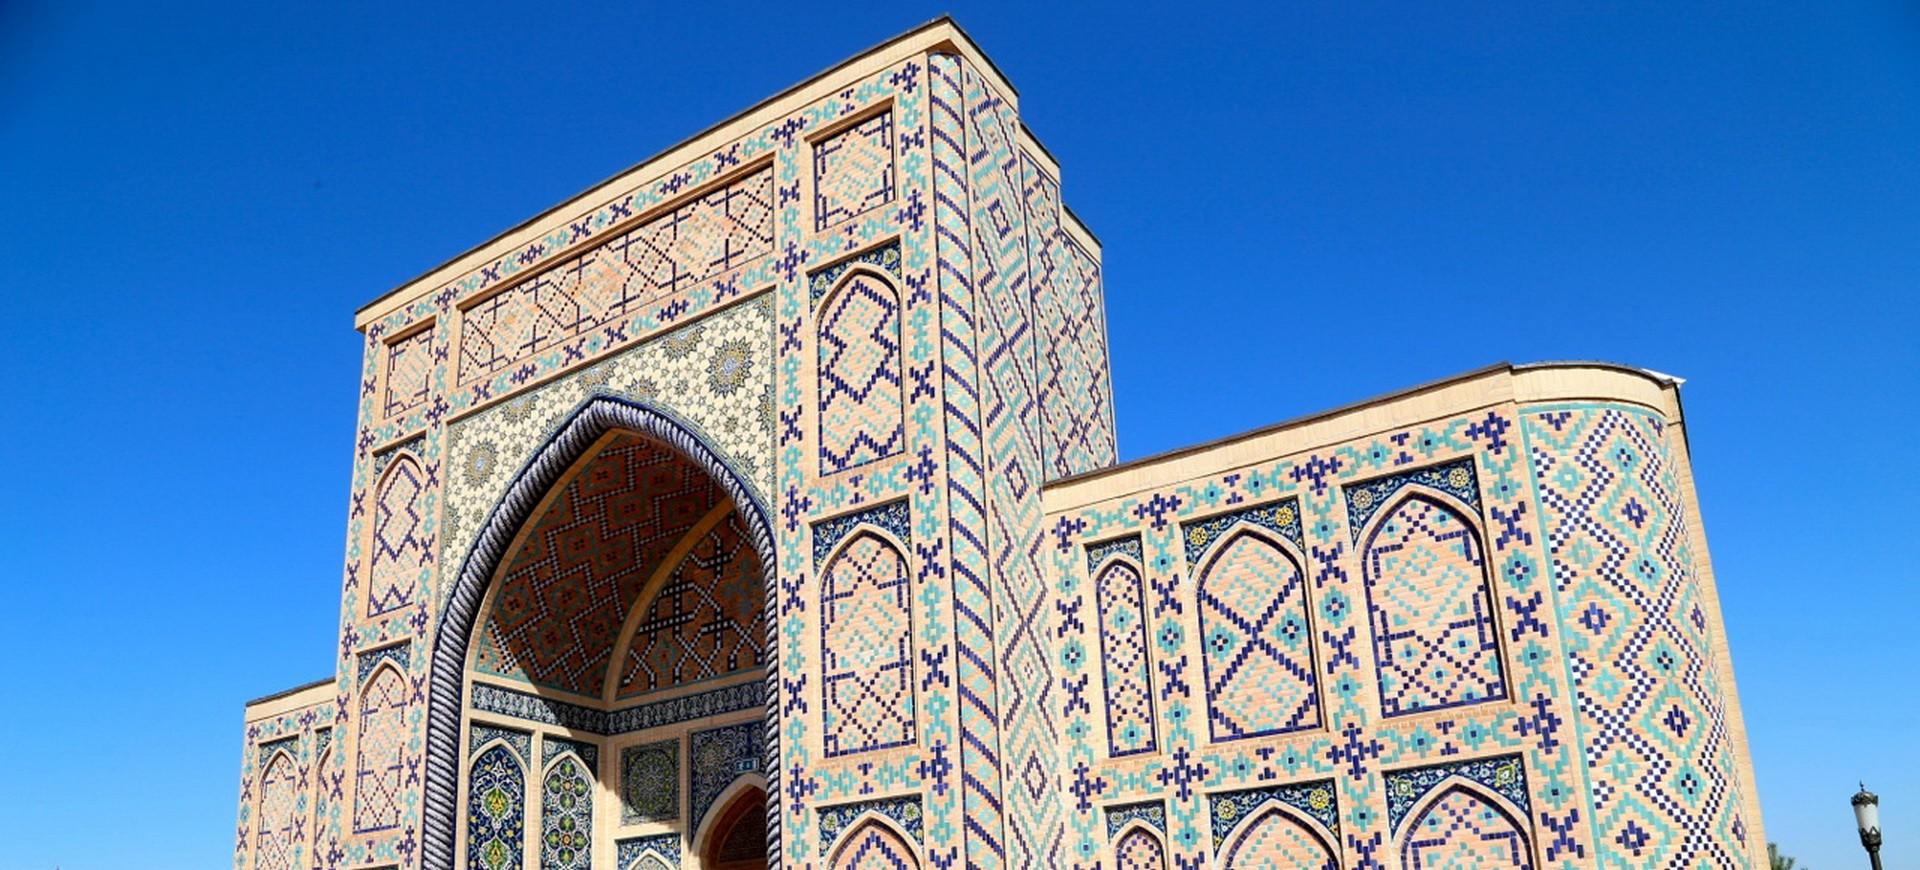 Musée Ulugbek Observatoire à Samarcande en Ouzbékistan